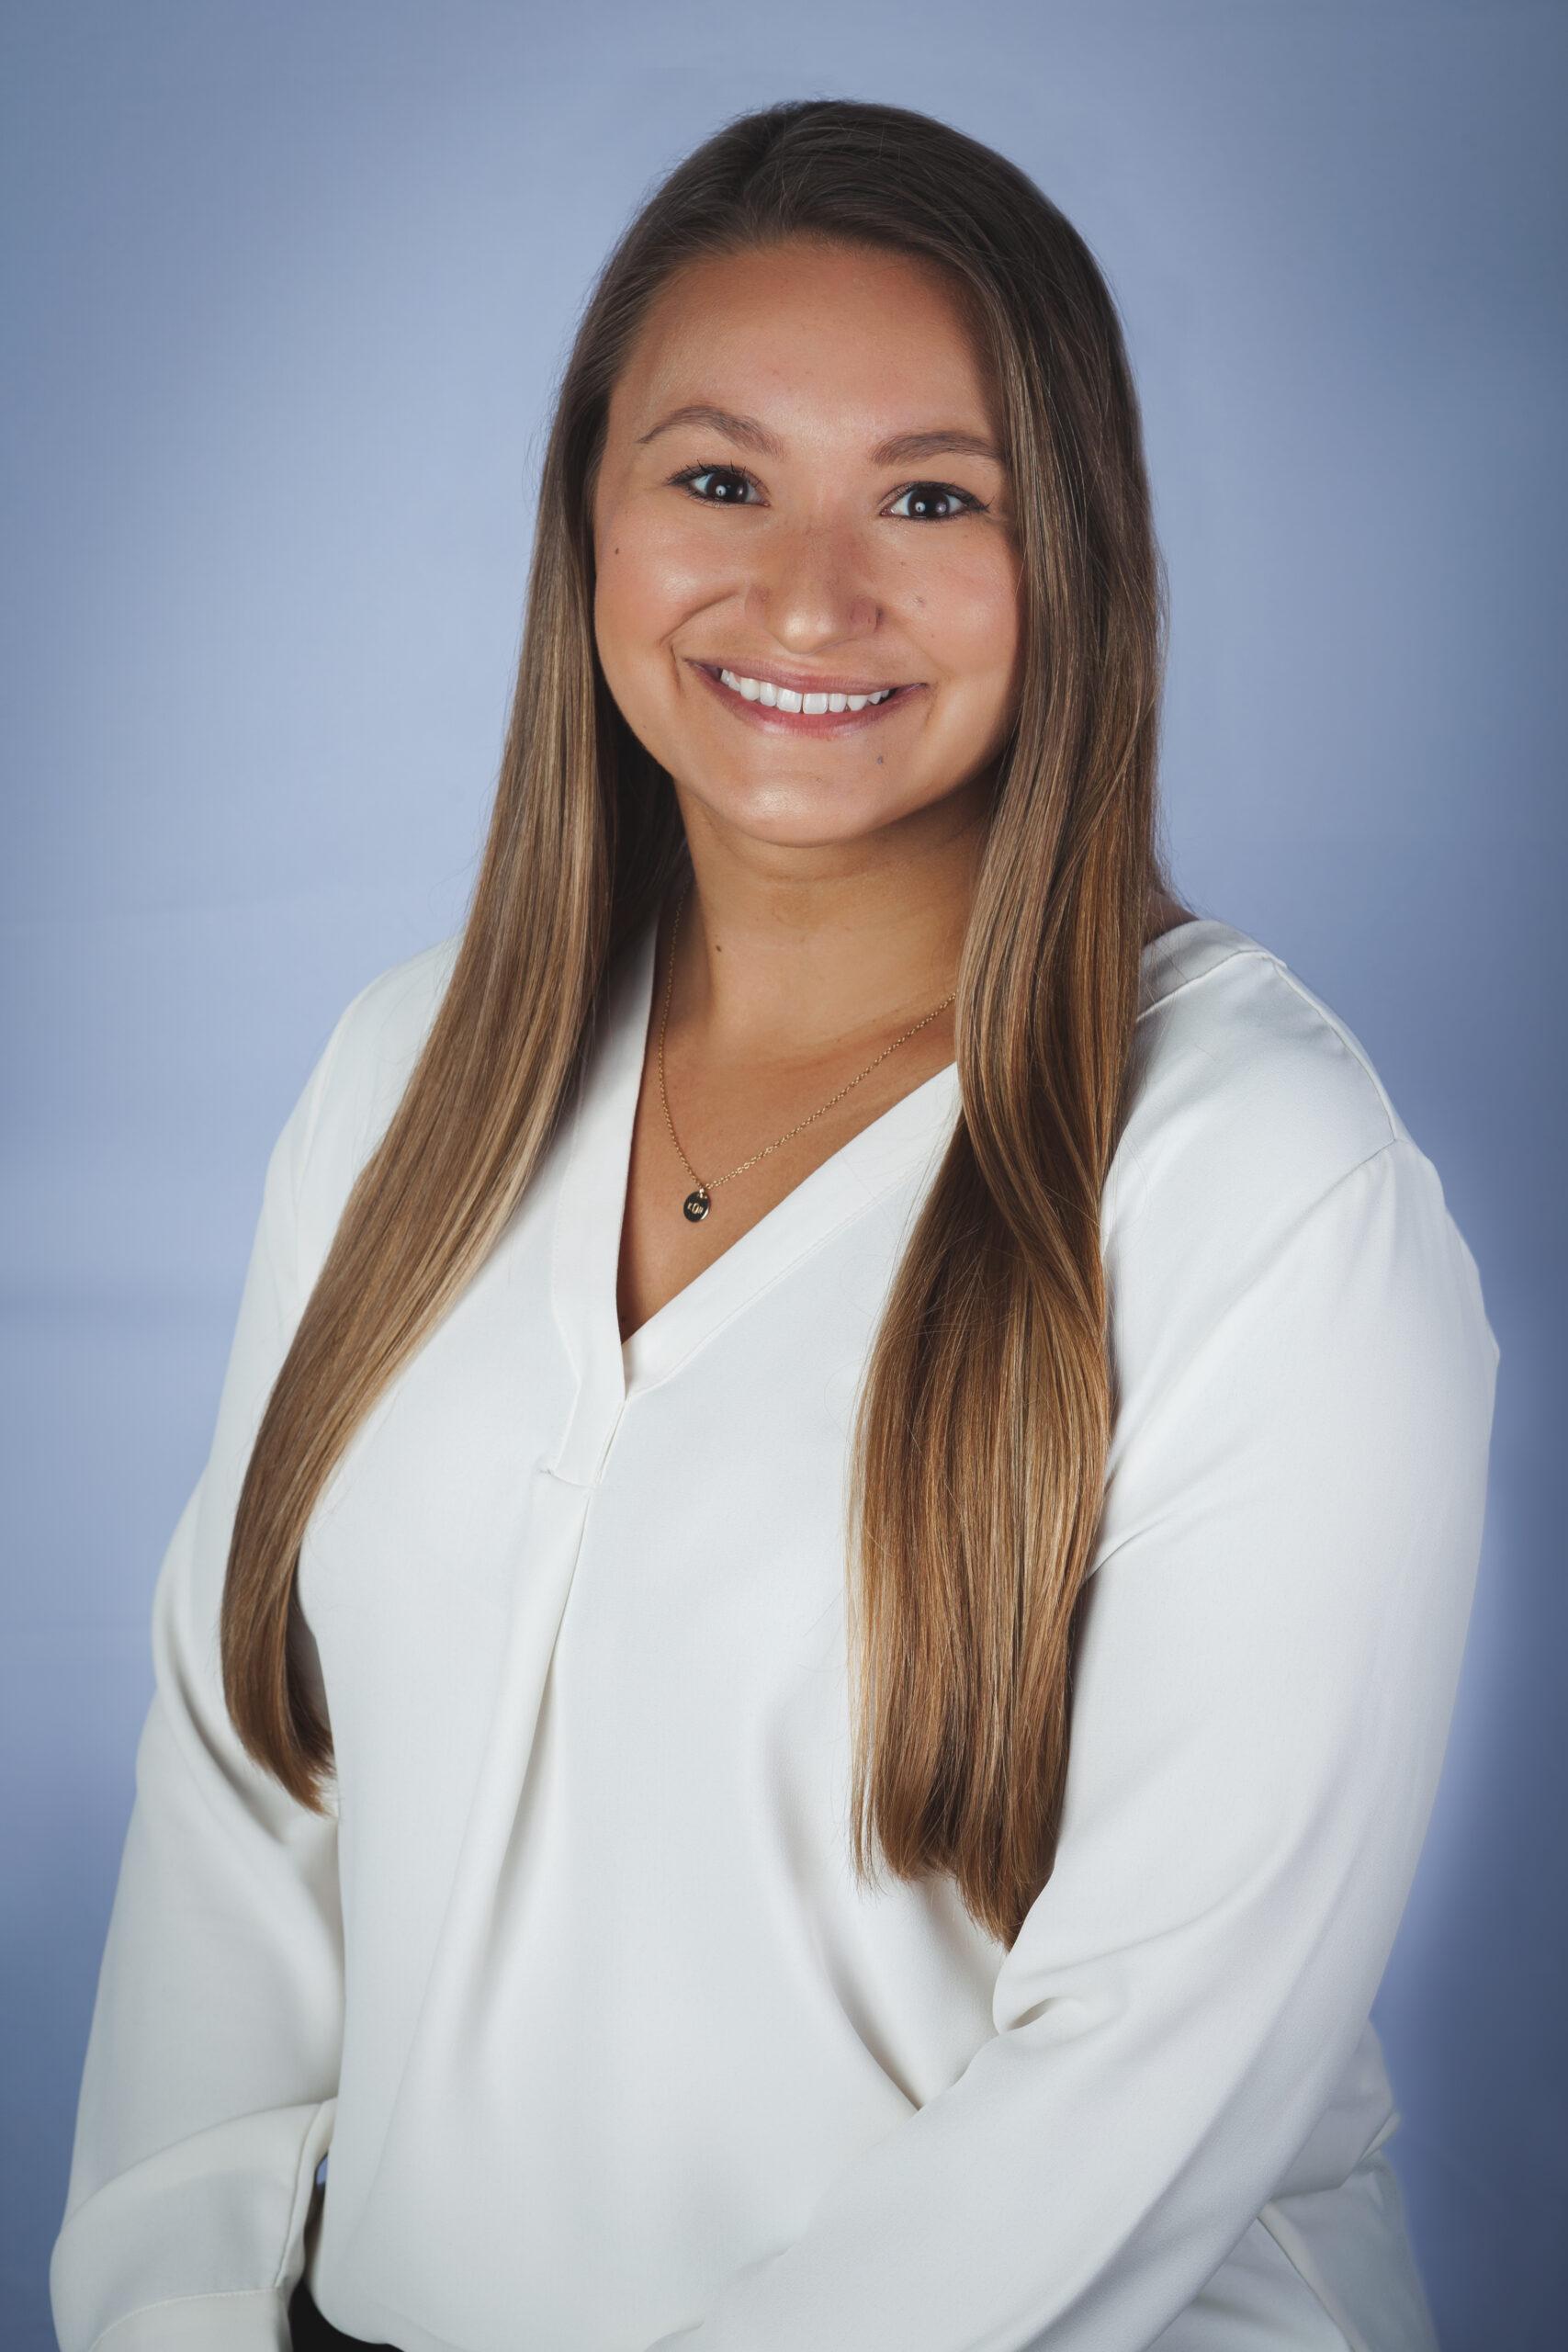 physician assistant Kailey Quintana